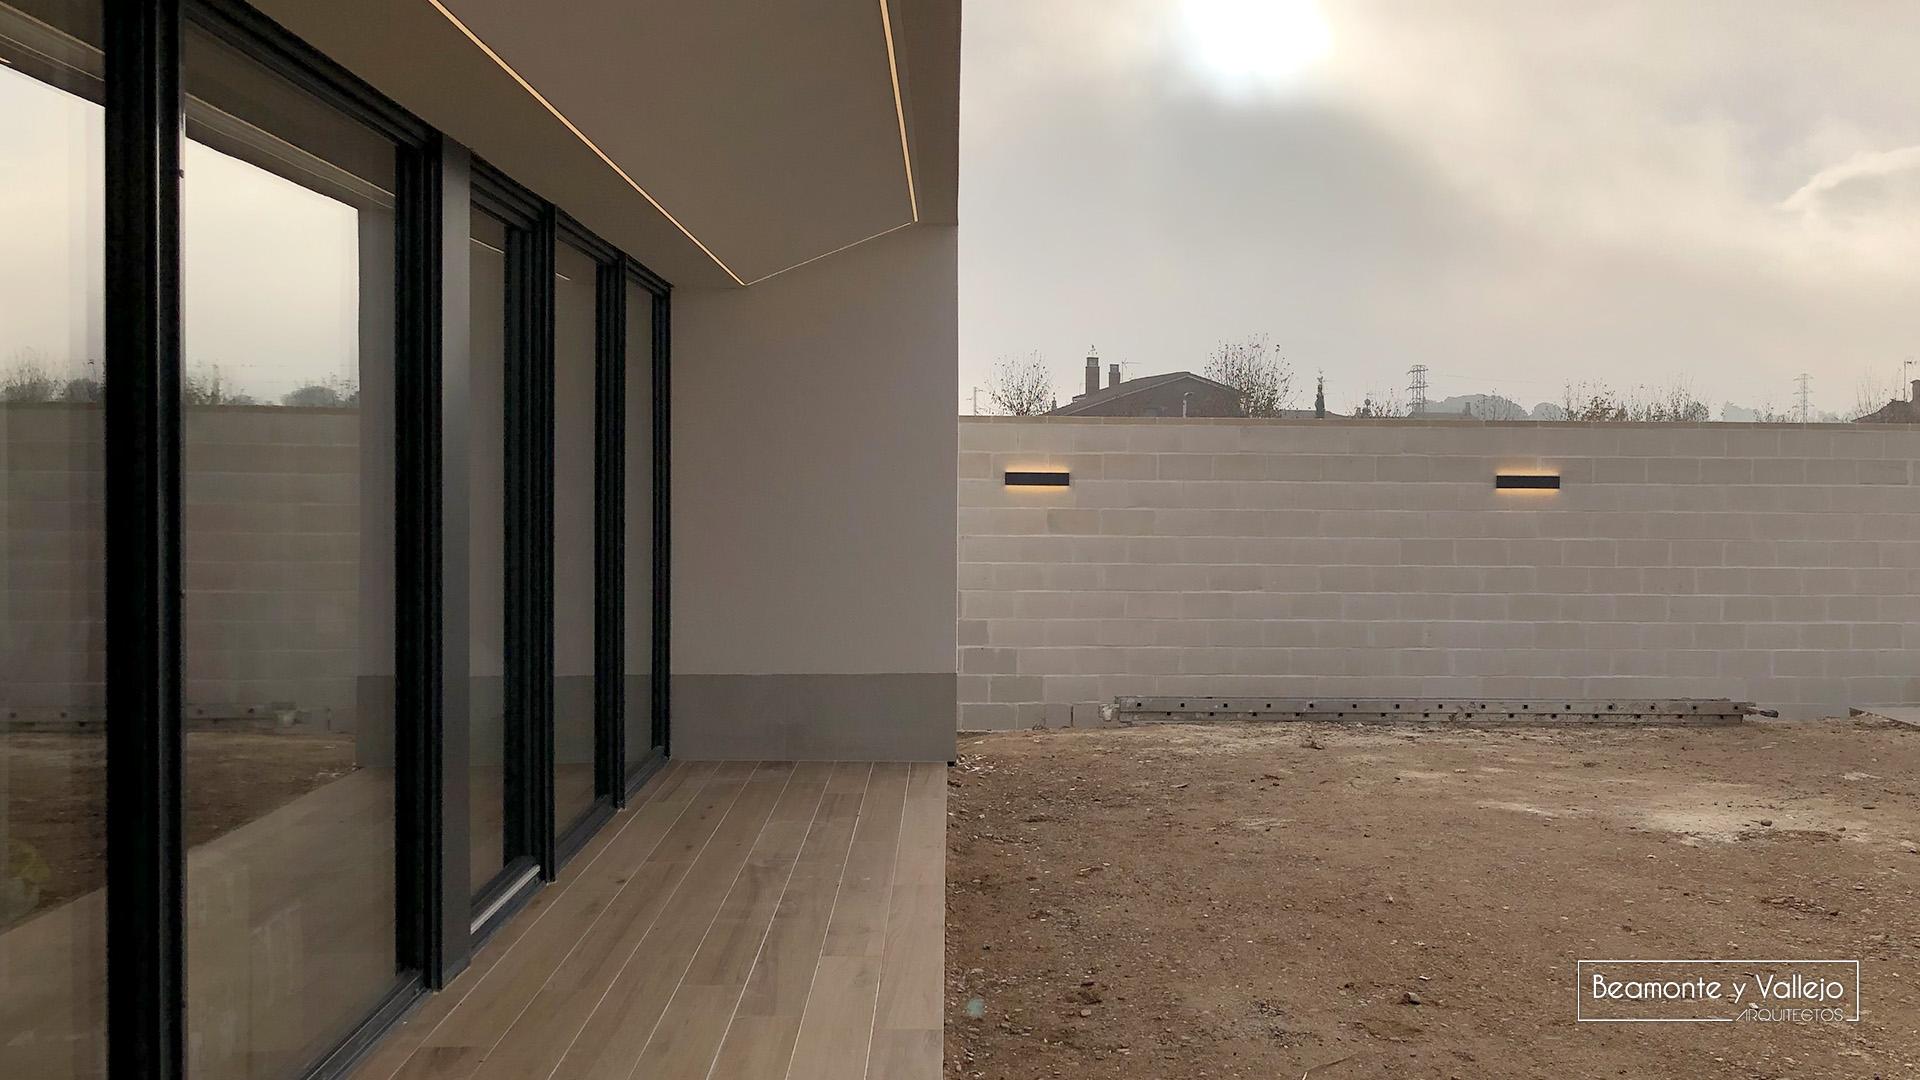 Beamonte y Vallejo arquitectos - Passivhaus, Utebo certificada 1